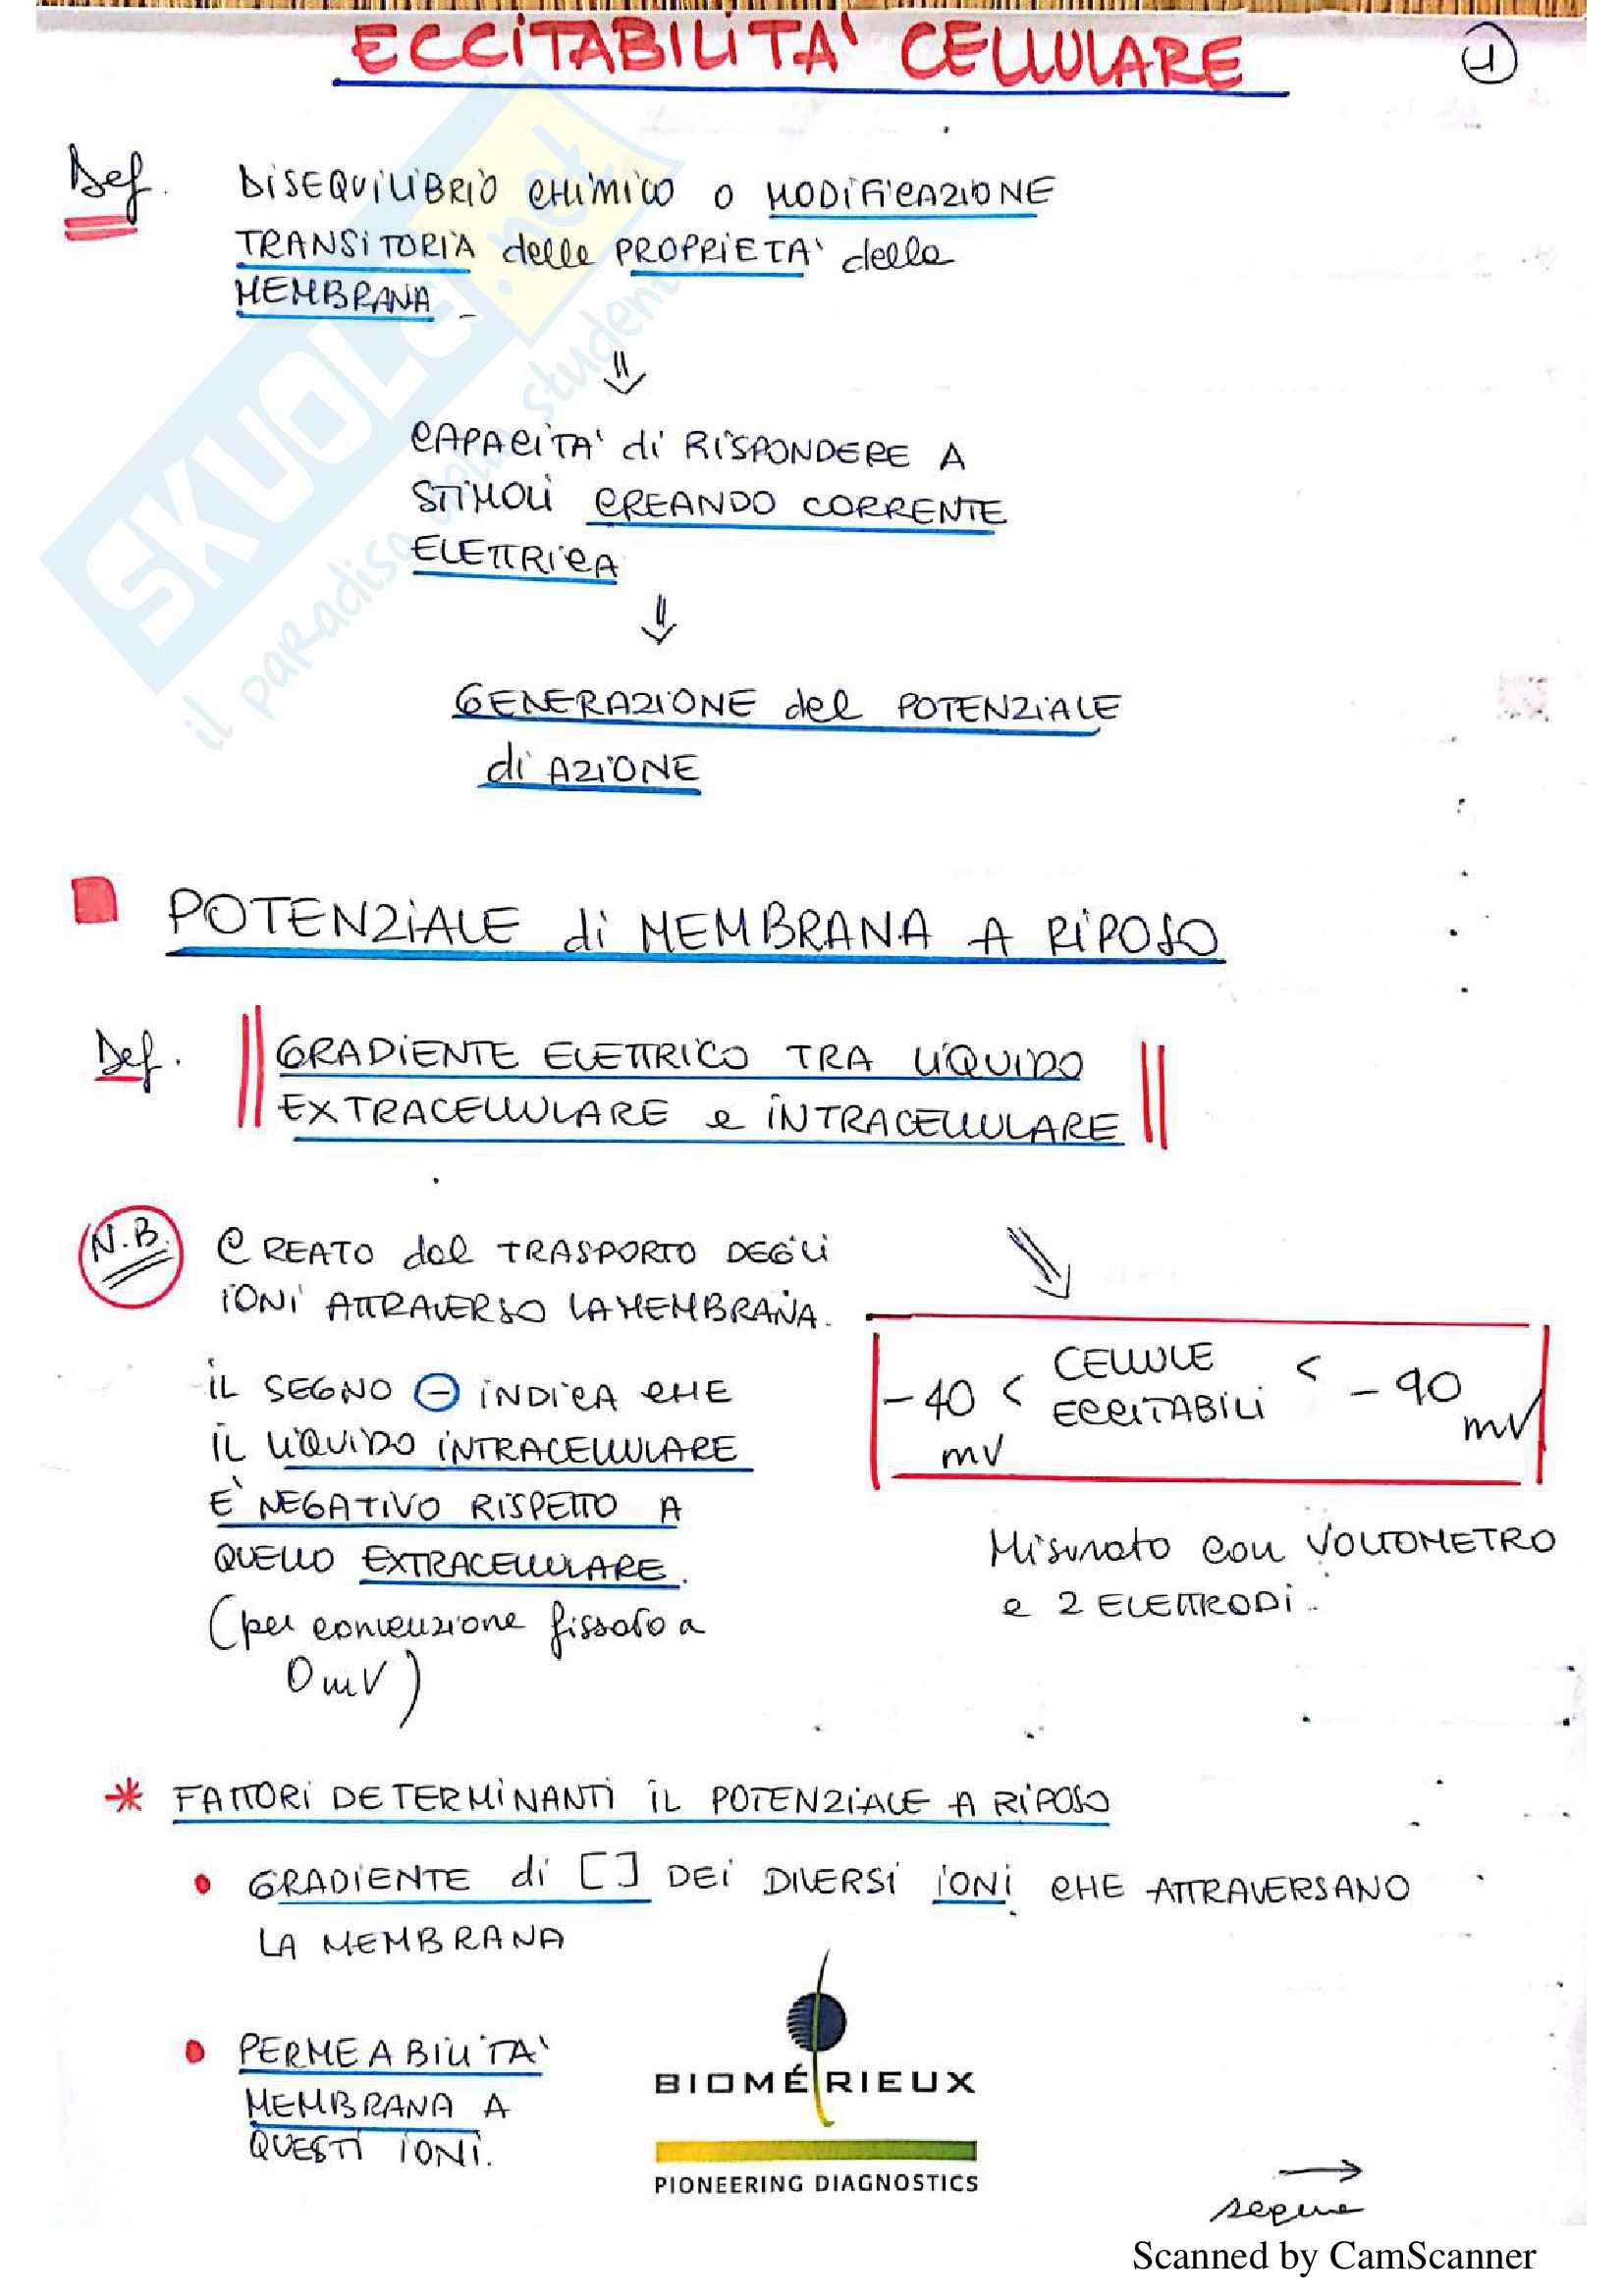 Riassunti e schemi di Fisiologia Generale, Martinoli Trettel